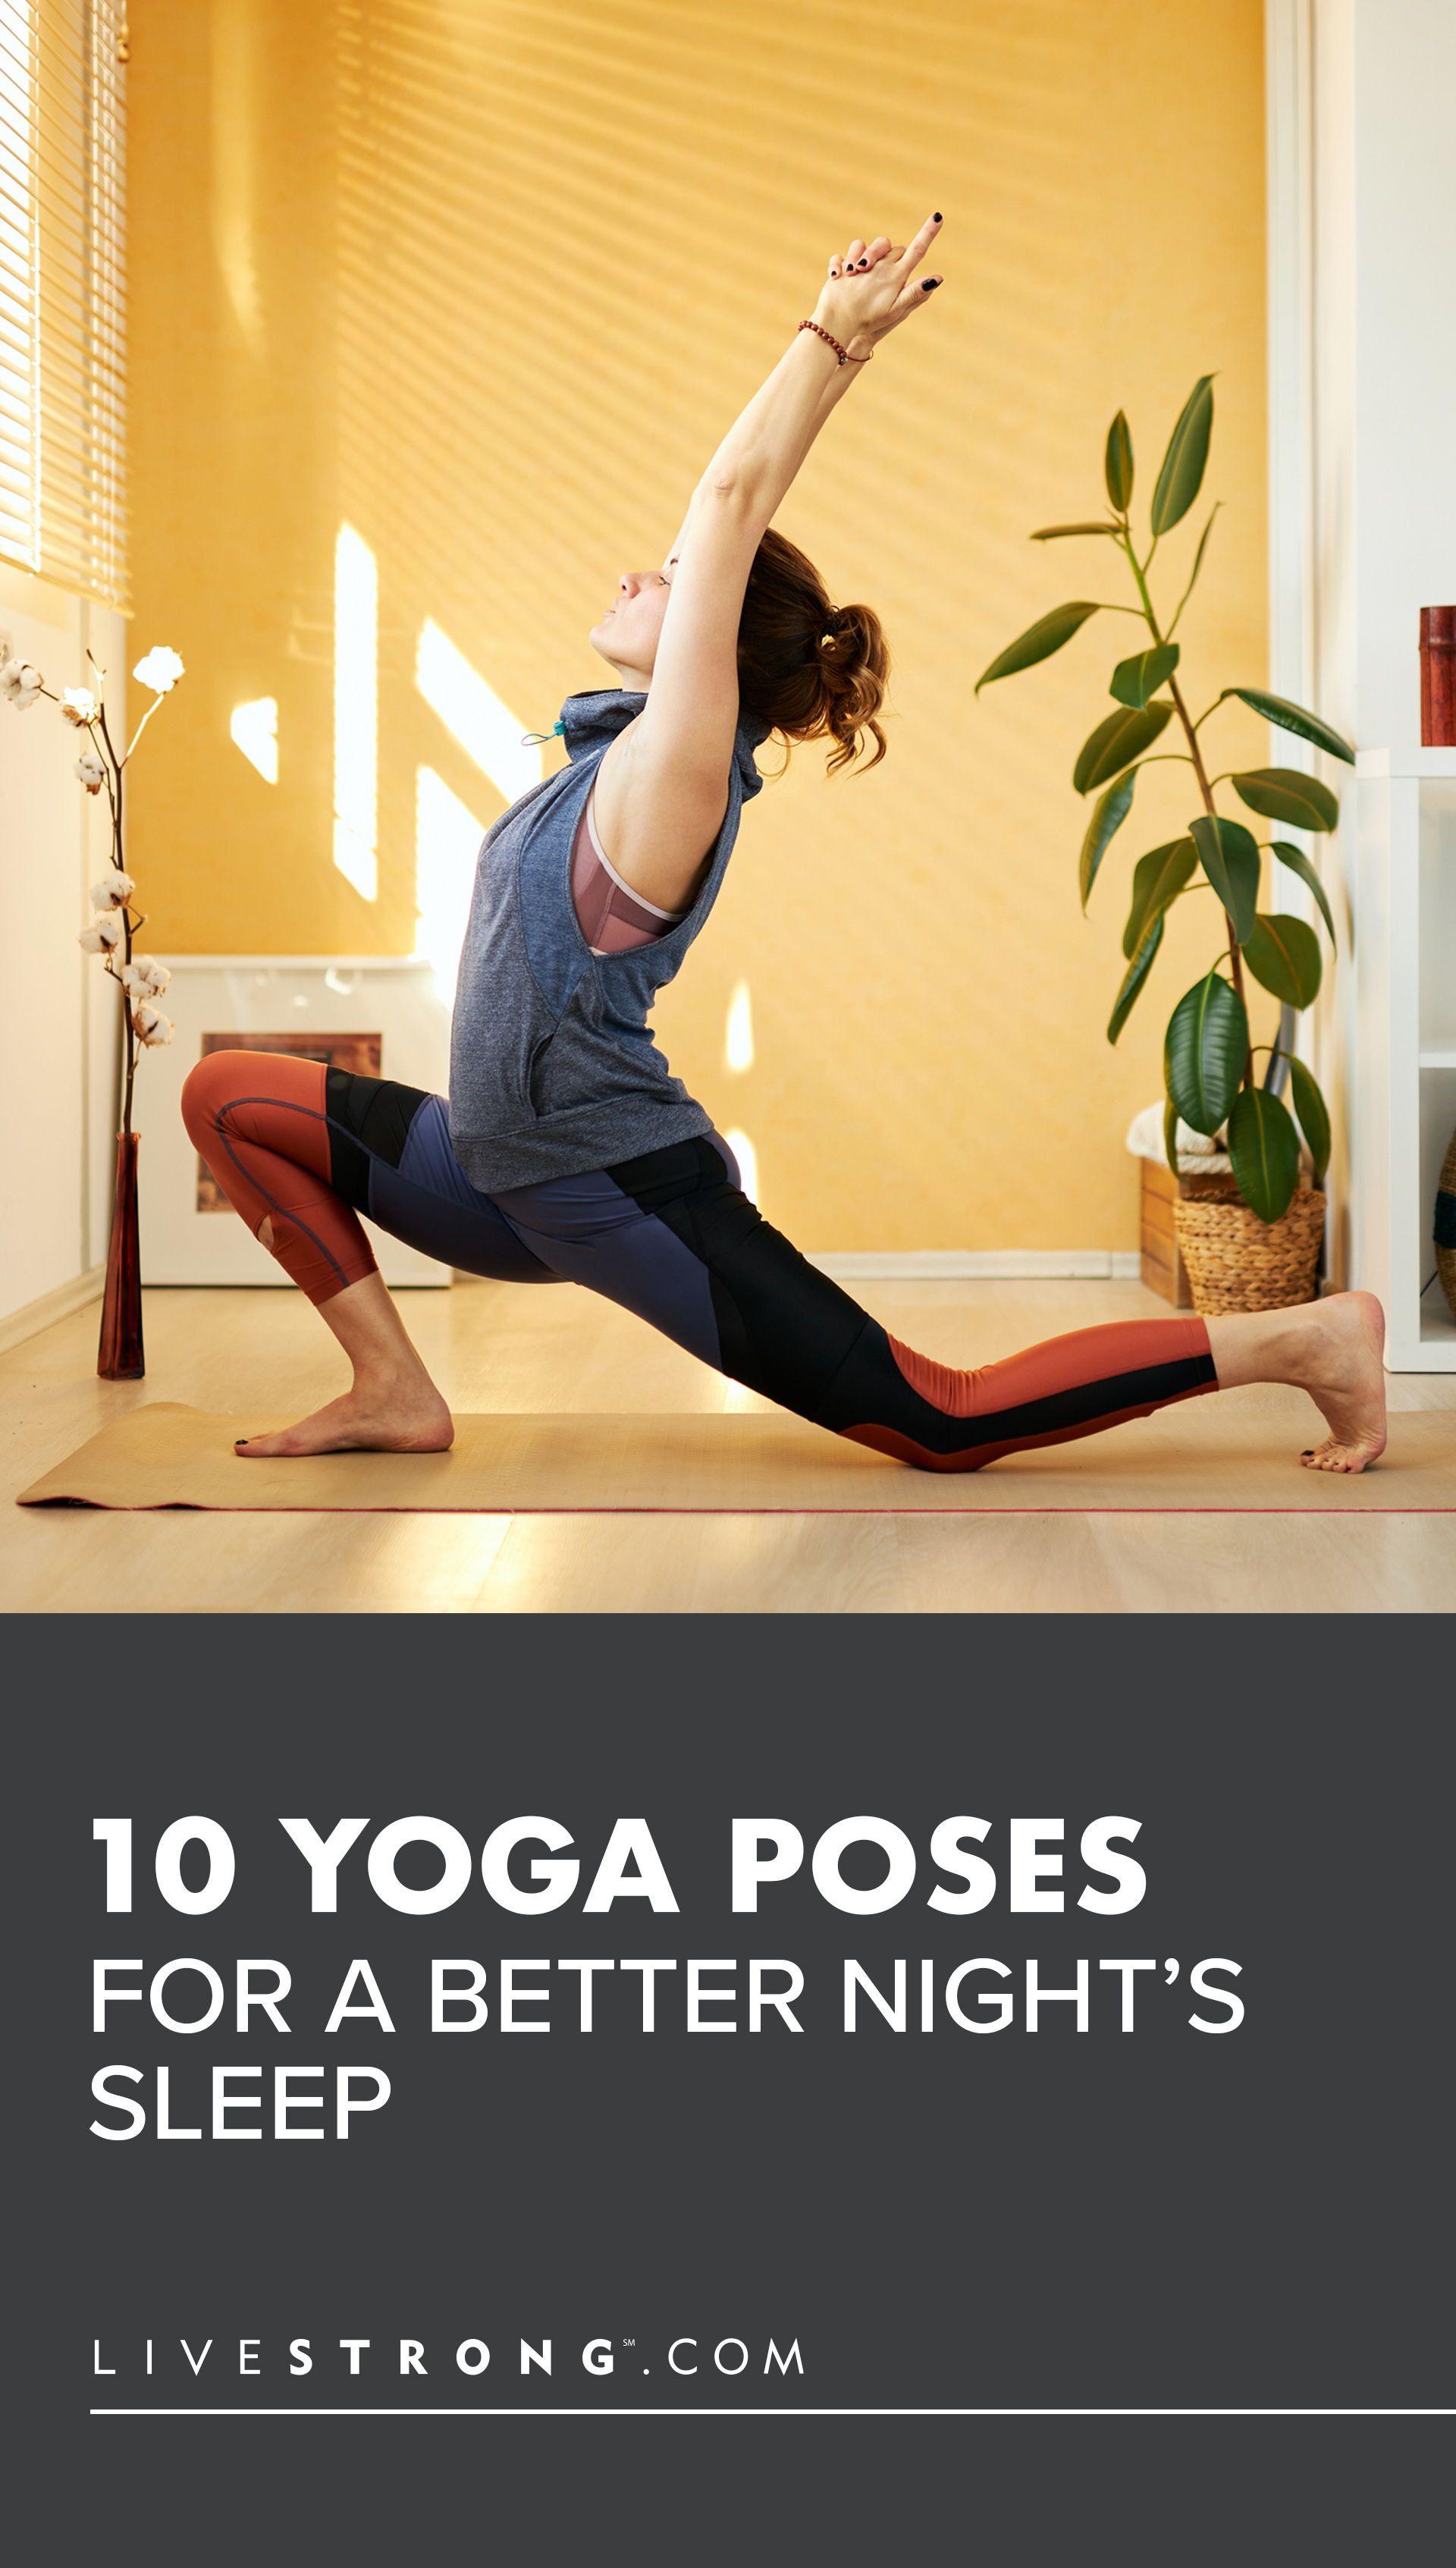 10 Yoga Poses for a Better Nights Sleep | Livestrong.com